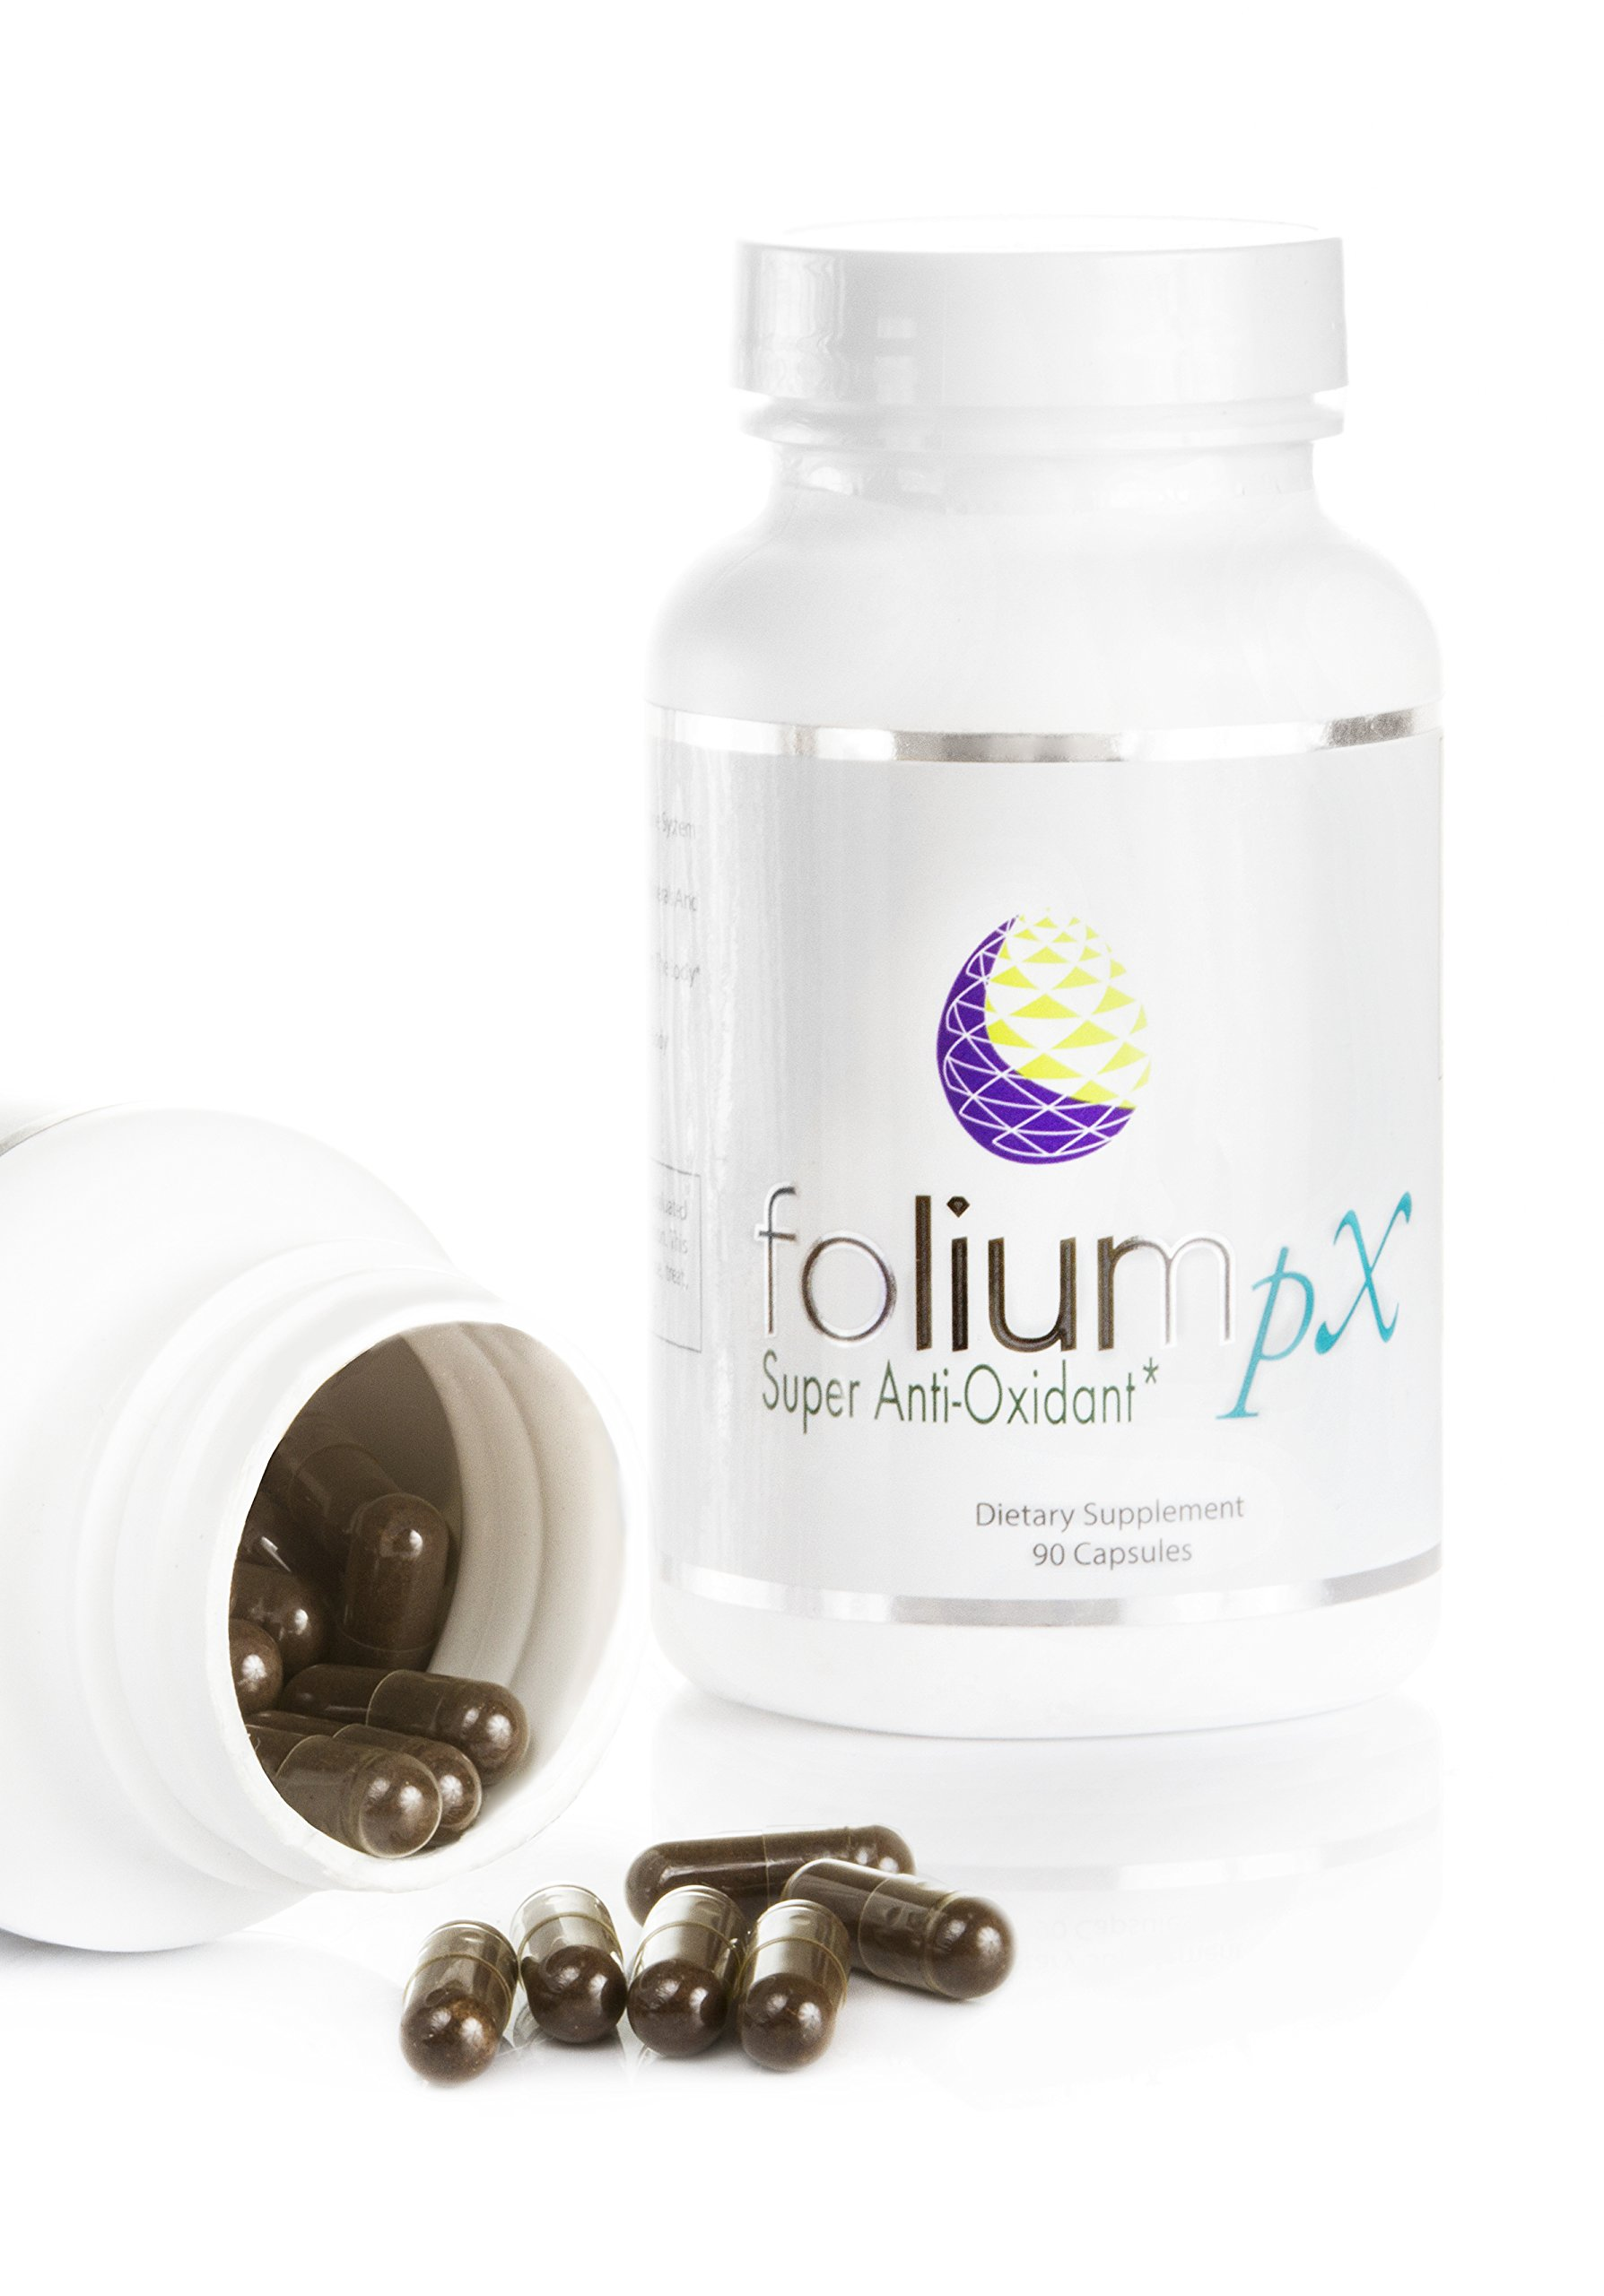 Folium pX Immune System Support, Full Body Cleanse, Heavy Metal Detox, Mercury, Lead, Arsenic, Barradium, Cadmium Poisoning, Super Antioxidant Supplement, Pine Bark, Grape-Seed Extract by FoliumpX